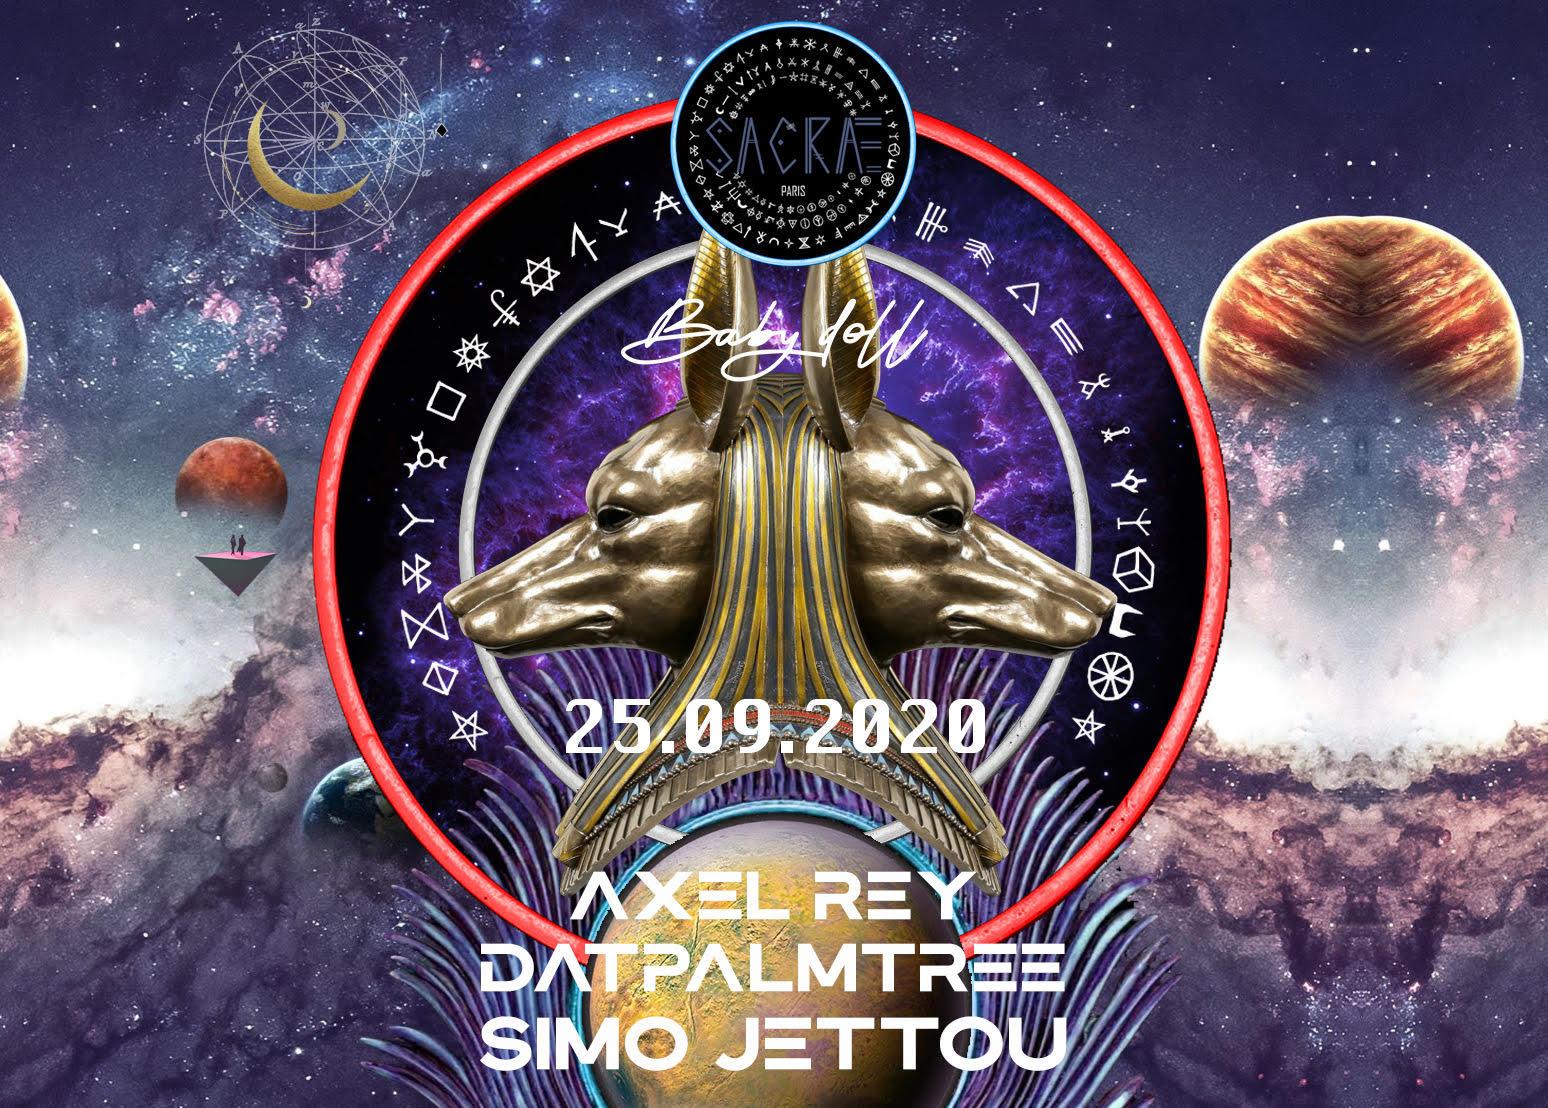 Simo Jettou x Datpalmtree x Axel rey - [SACRÆ x BABYDOLL] (25.09.2020)